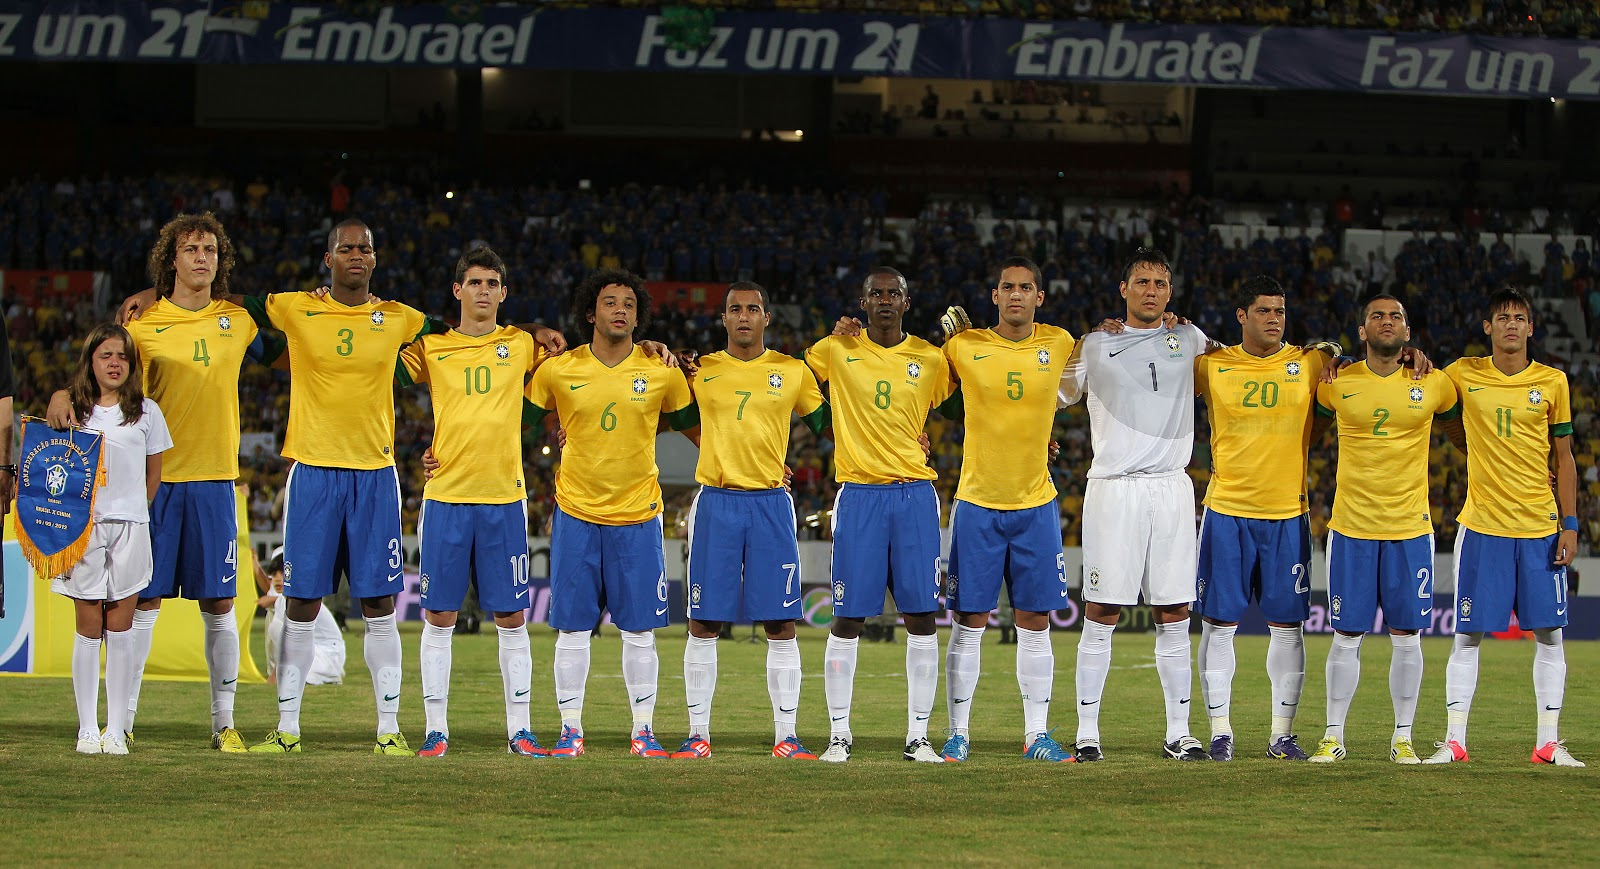 Incrivel Hulk: Brasil 8 x 0 China: que goleada!